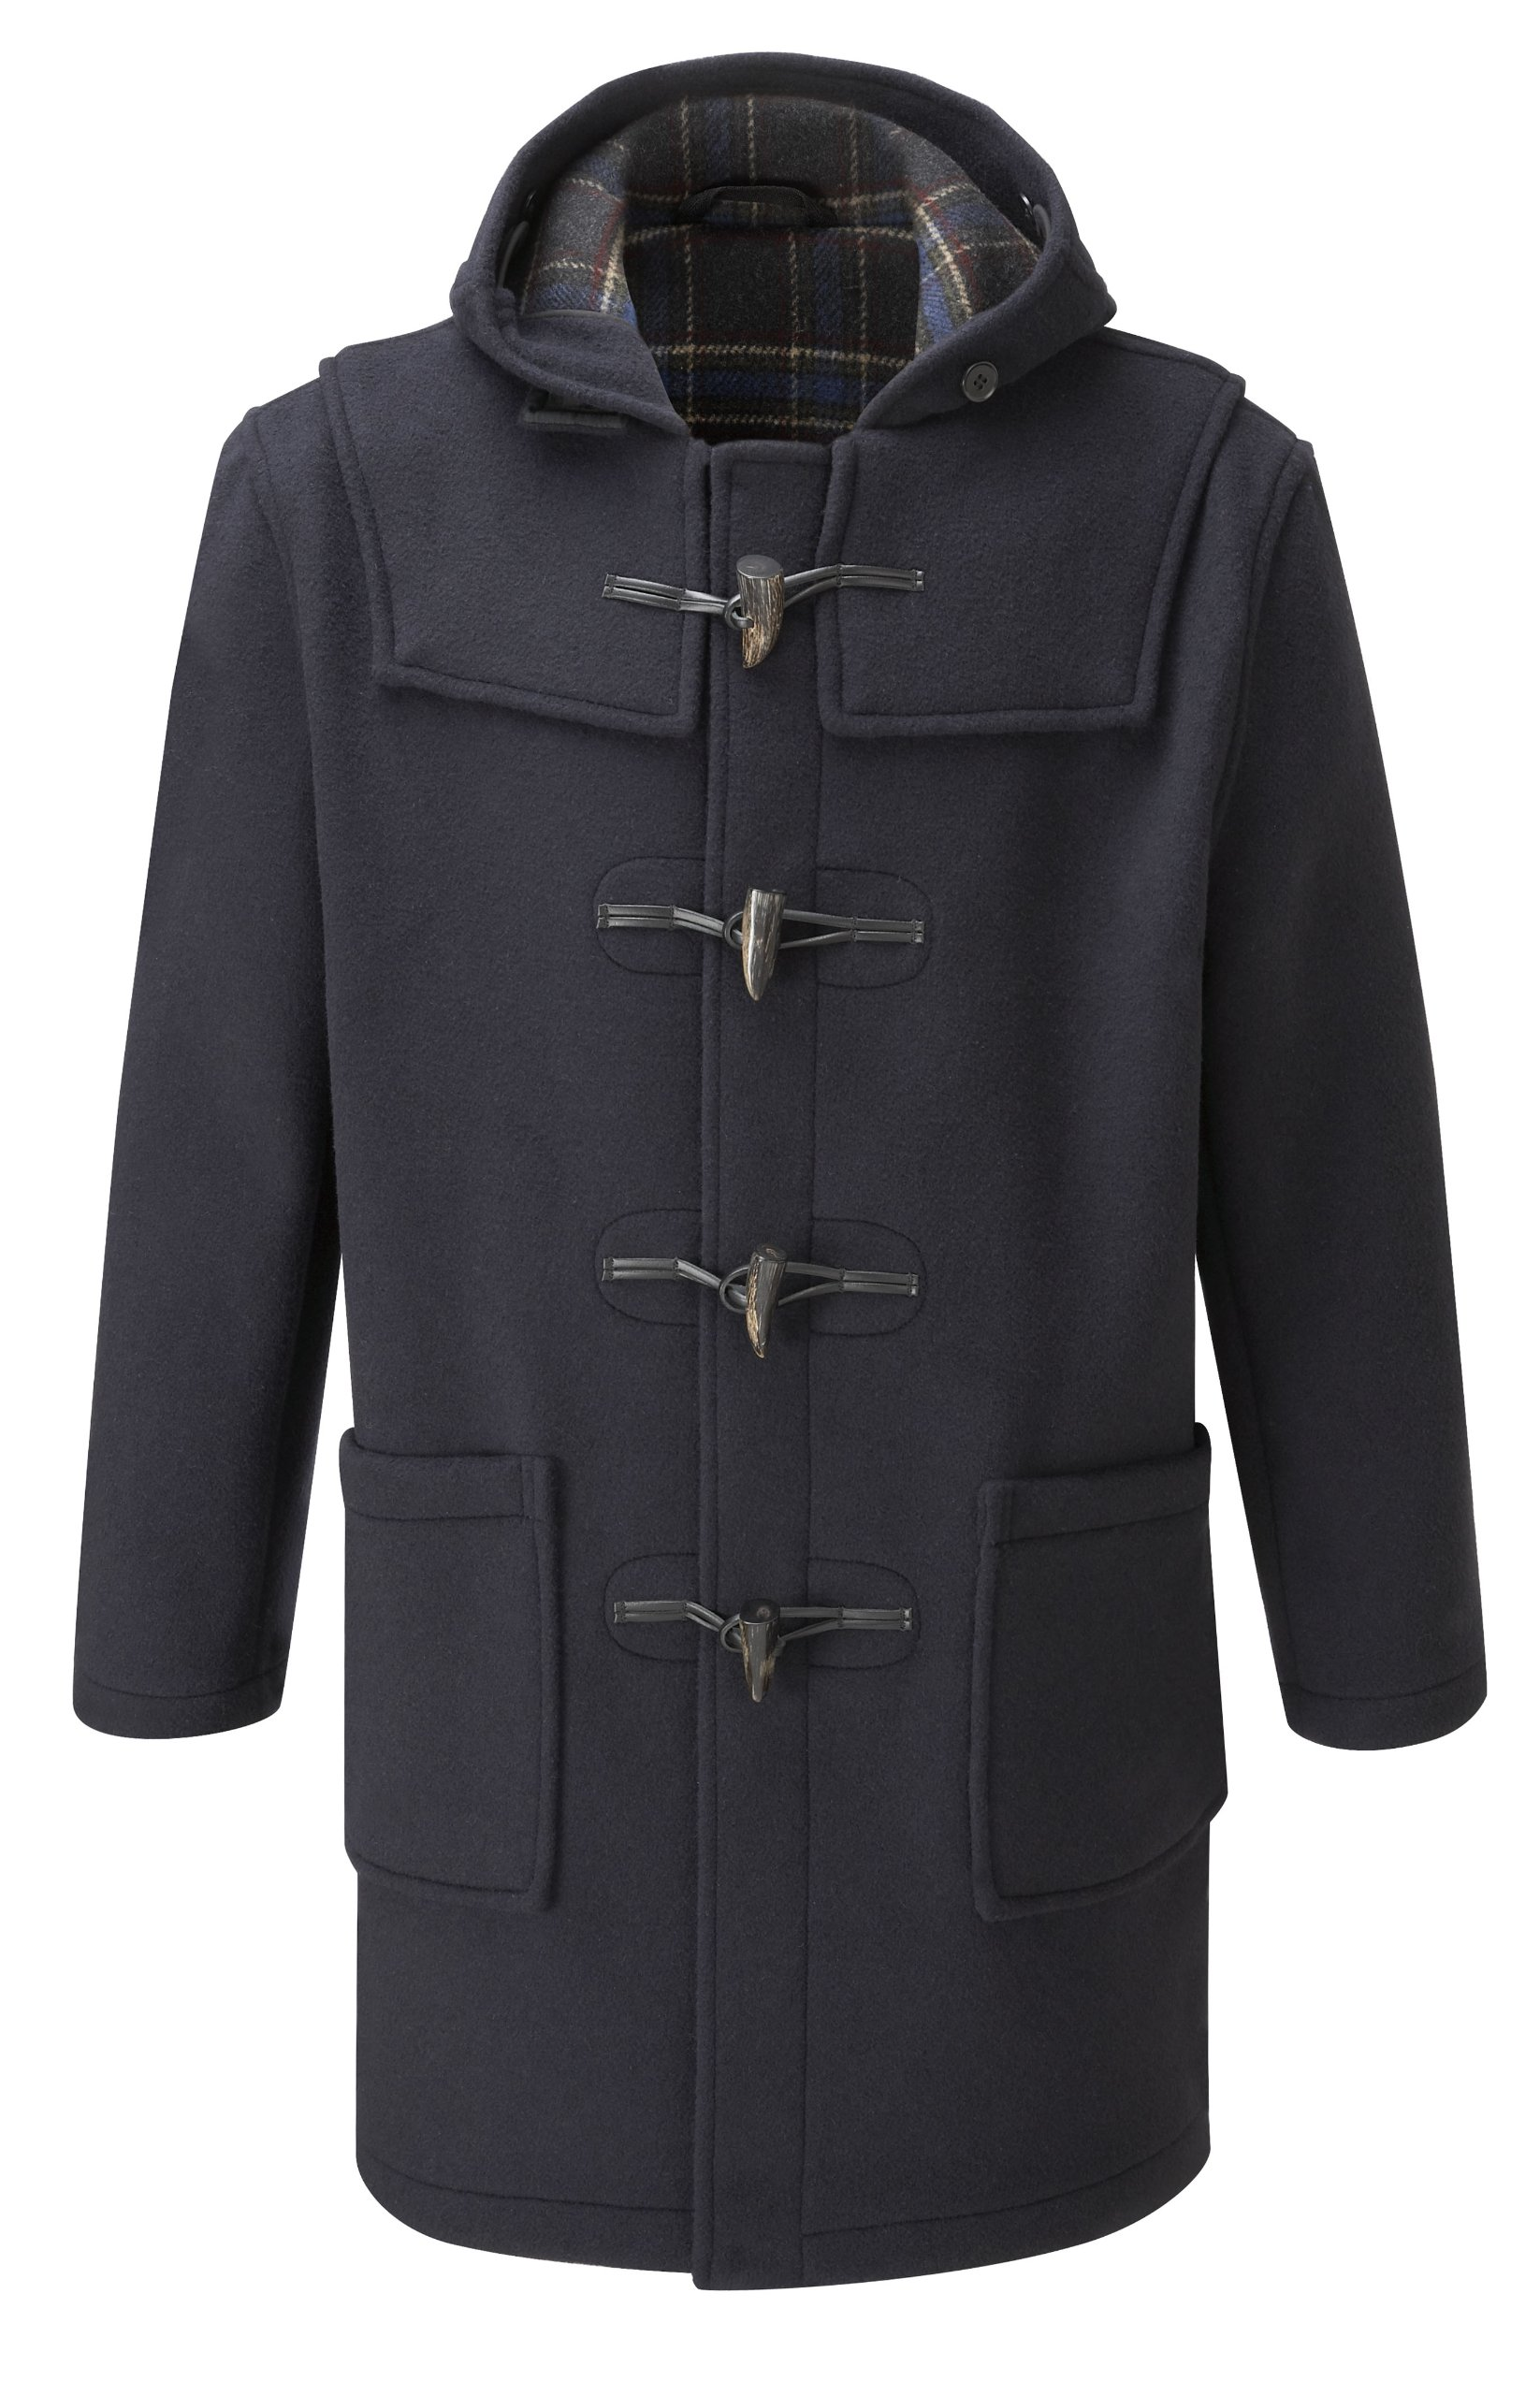 Original Montgomery Mens Duffle Coat (Size 42, Navy) by Original Montgomery